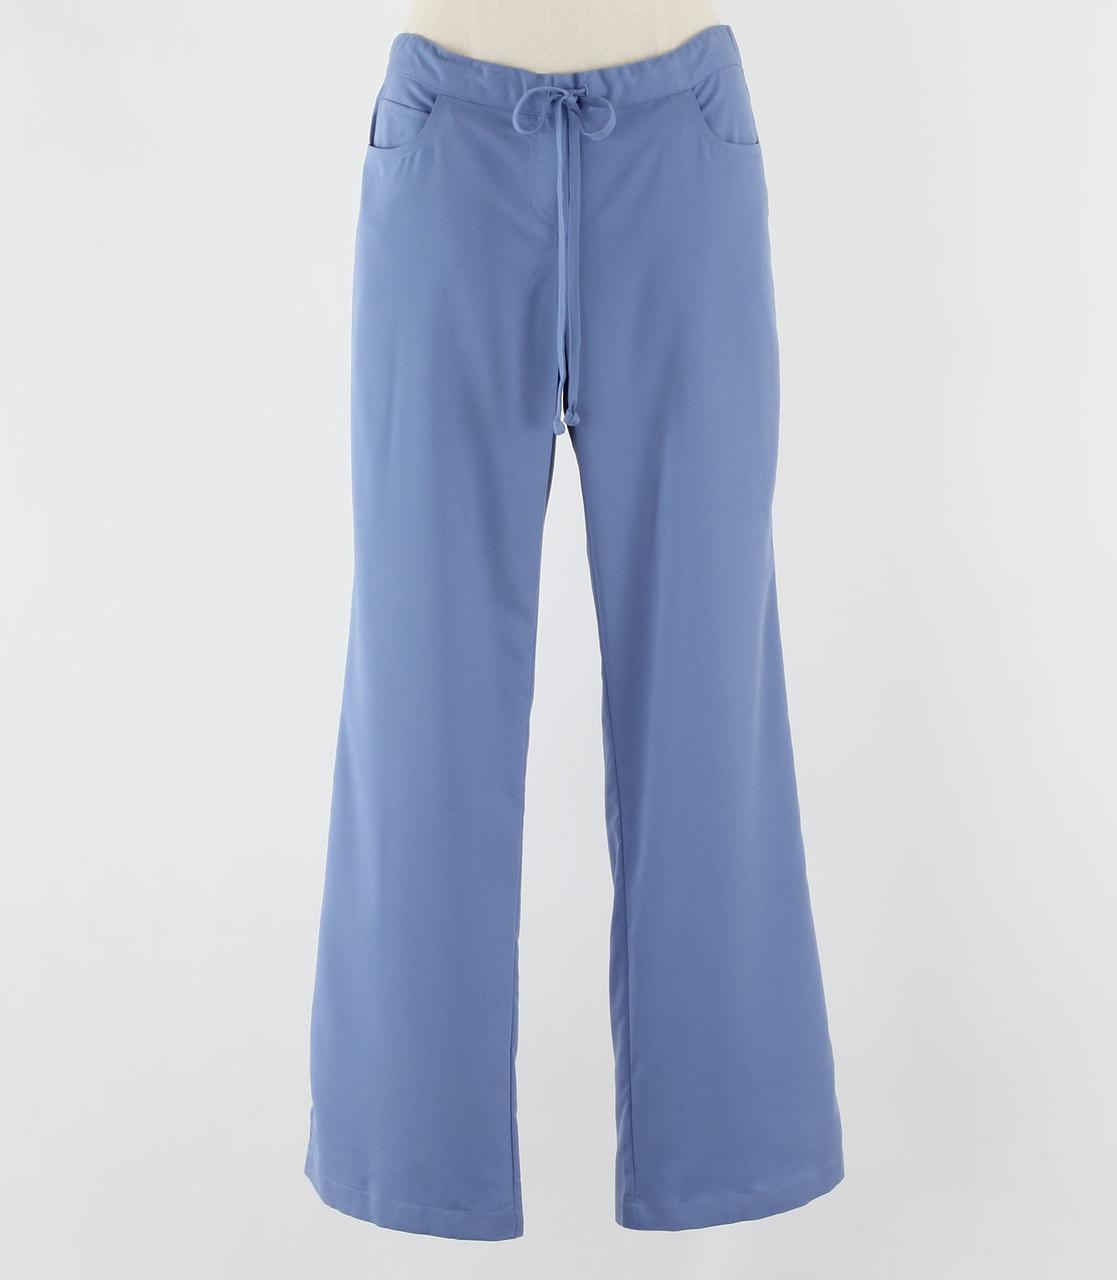 Greys Anatomy Womens Scrub Pants Ciel - Petite - Scrub Med